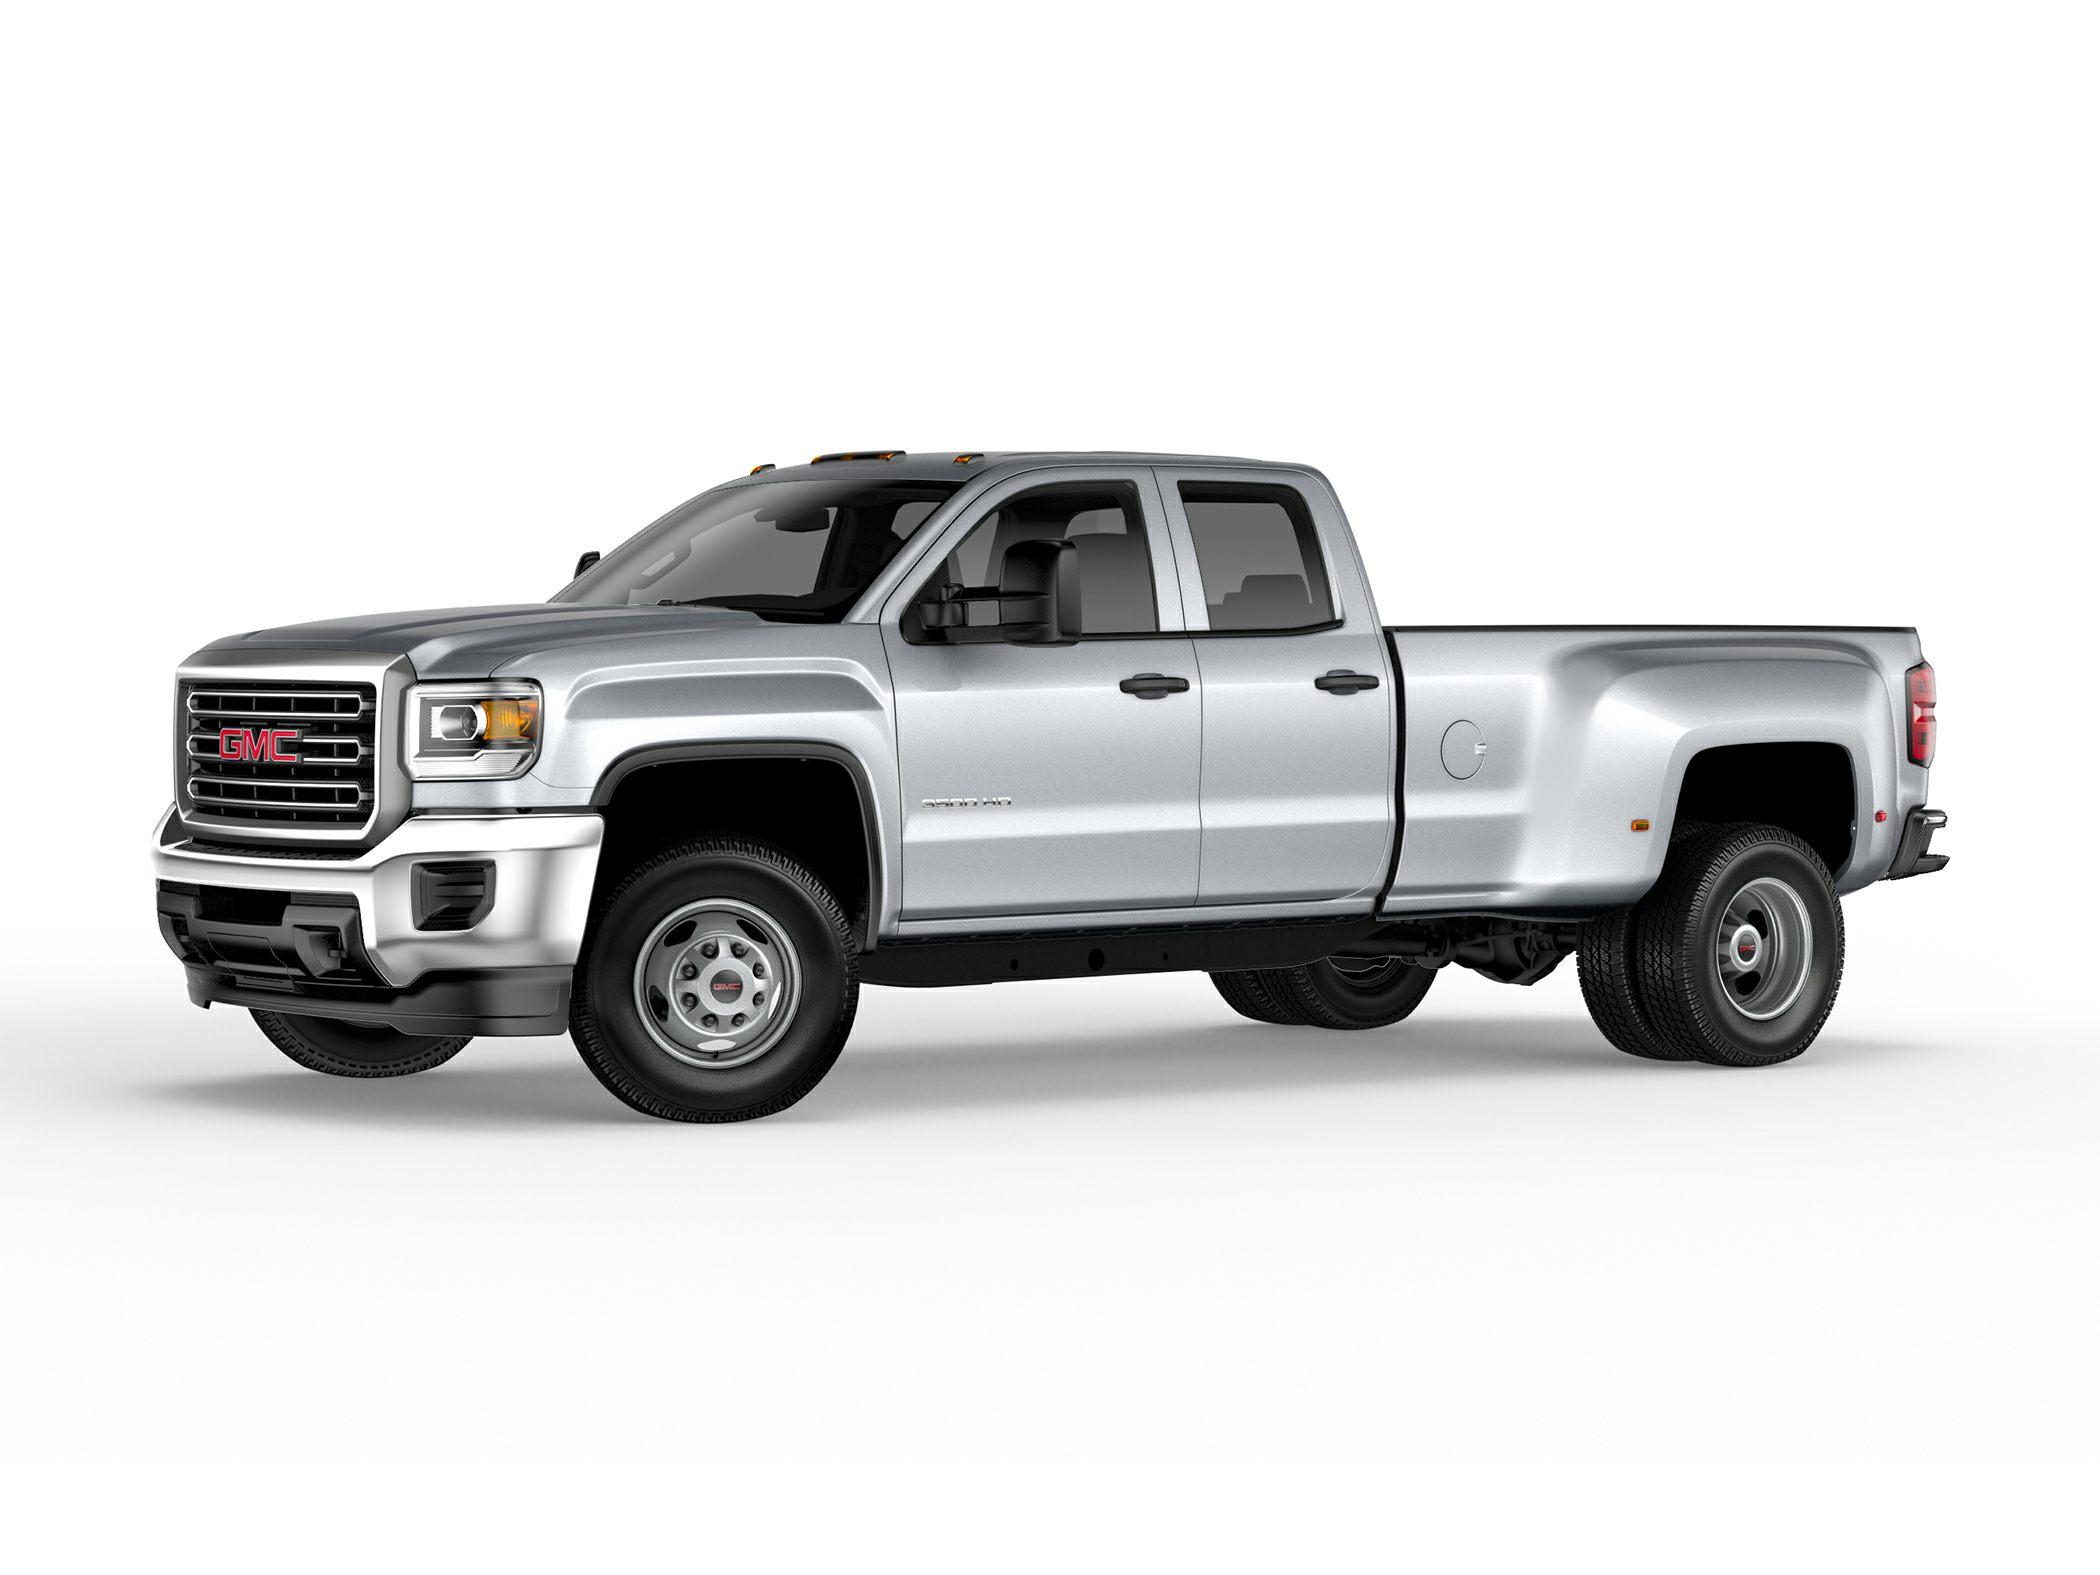 Craigslist Kenosha Racine Cars And Trucks By Owner